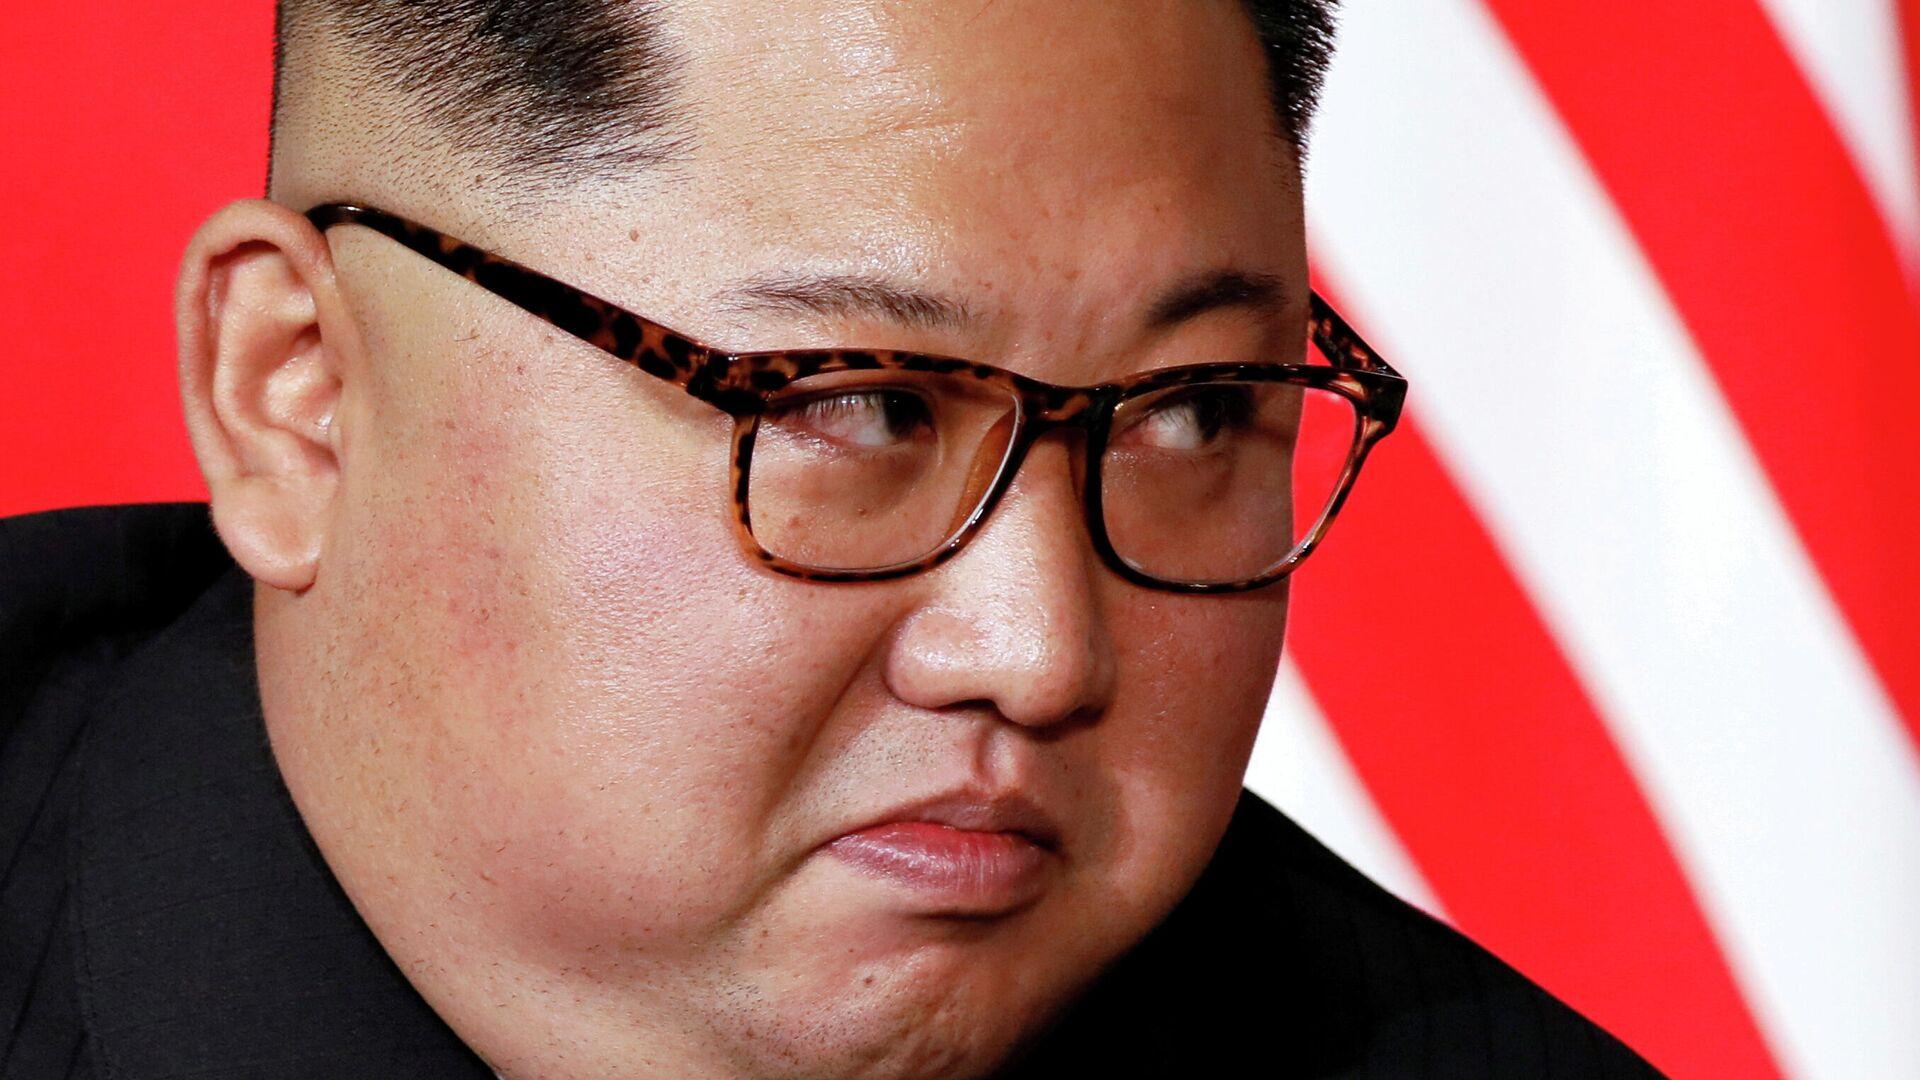 Kim Jong-un, líder supremo de Corea del Norte - Sputnik Mundo, 1920, 27.05.2021